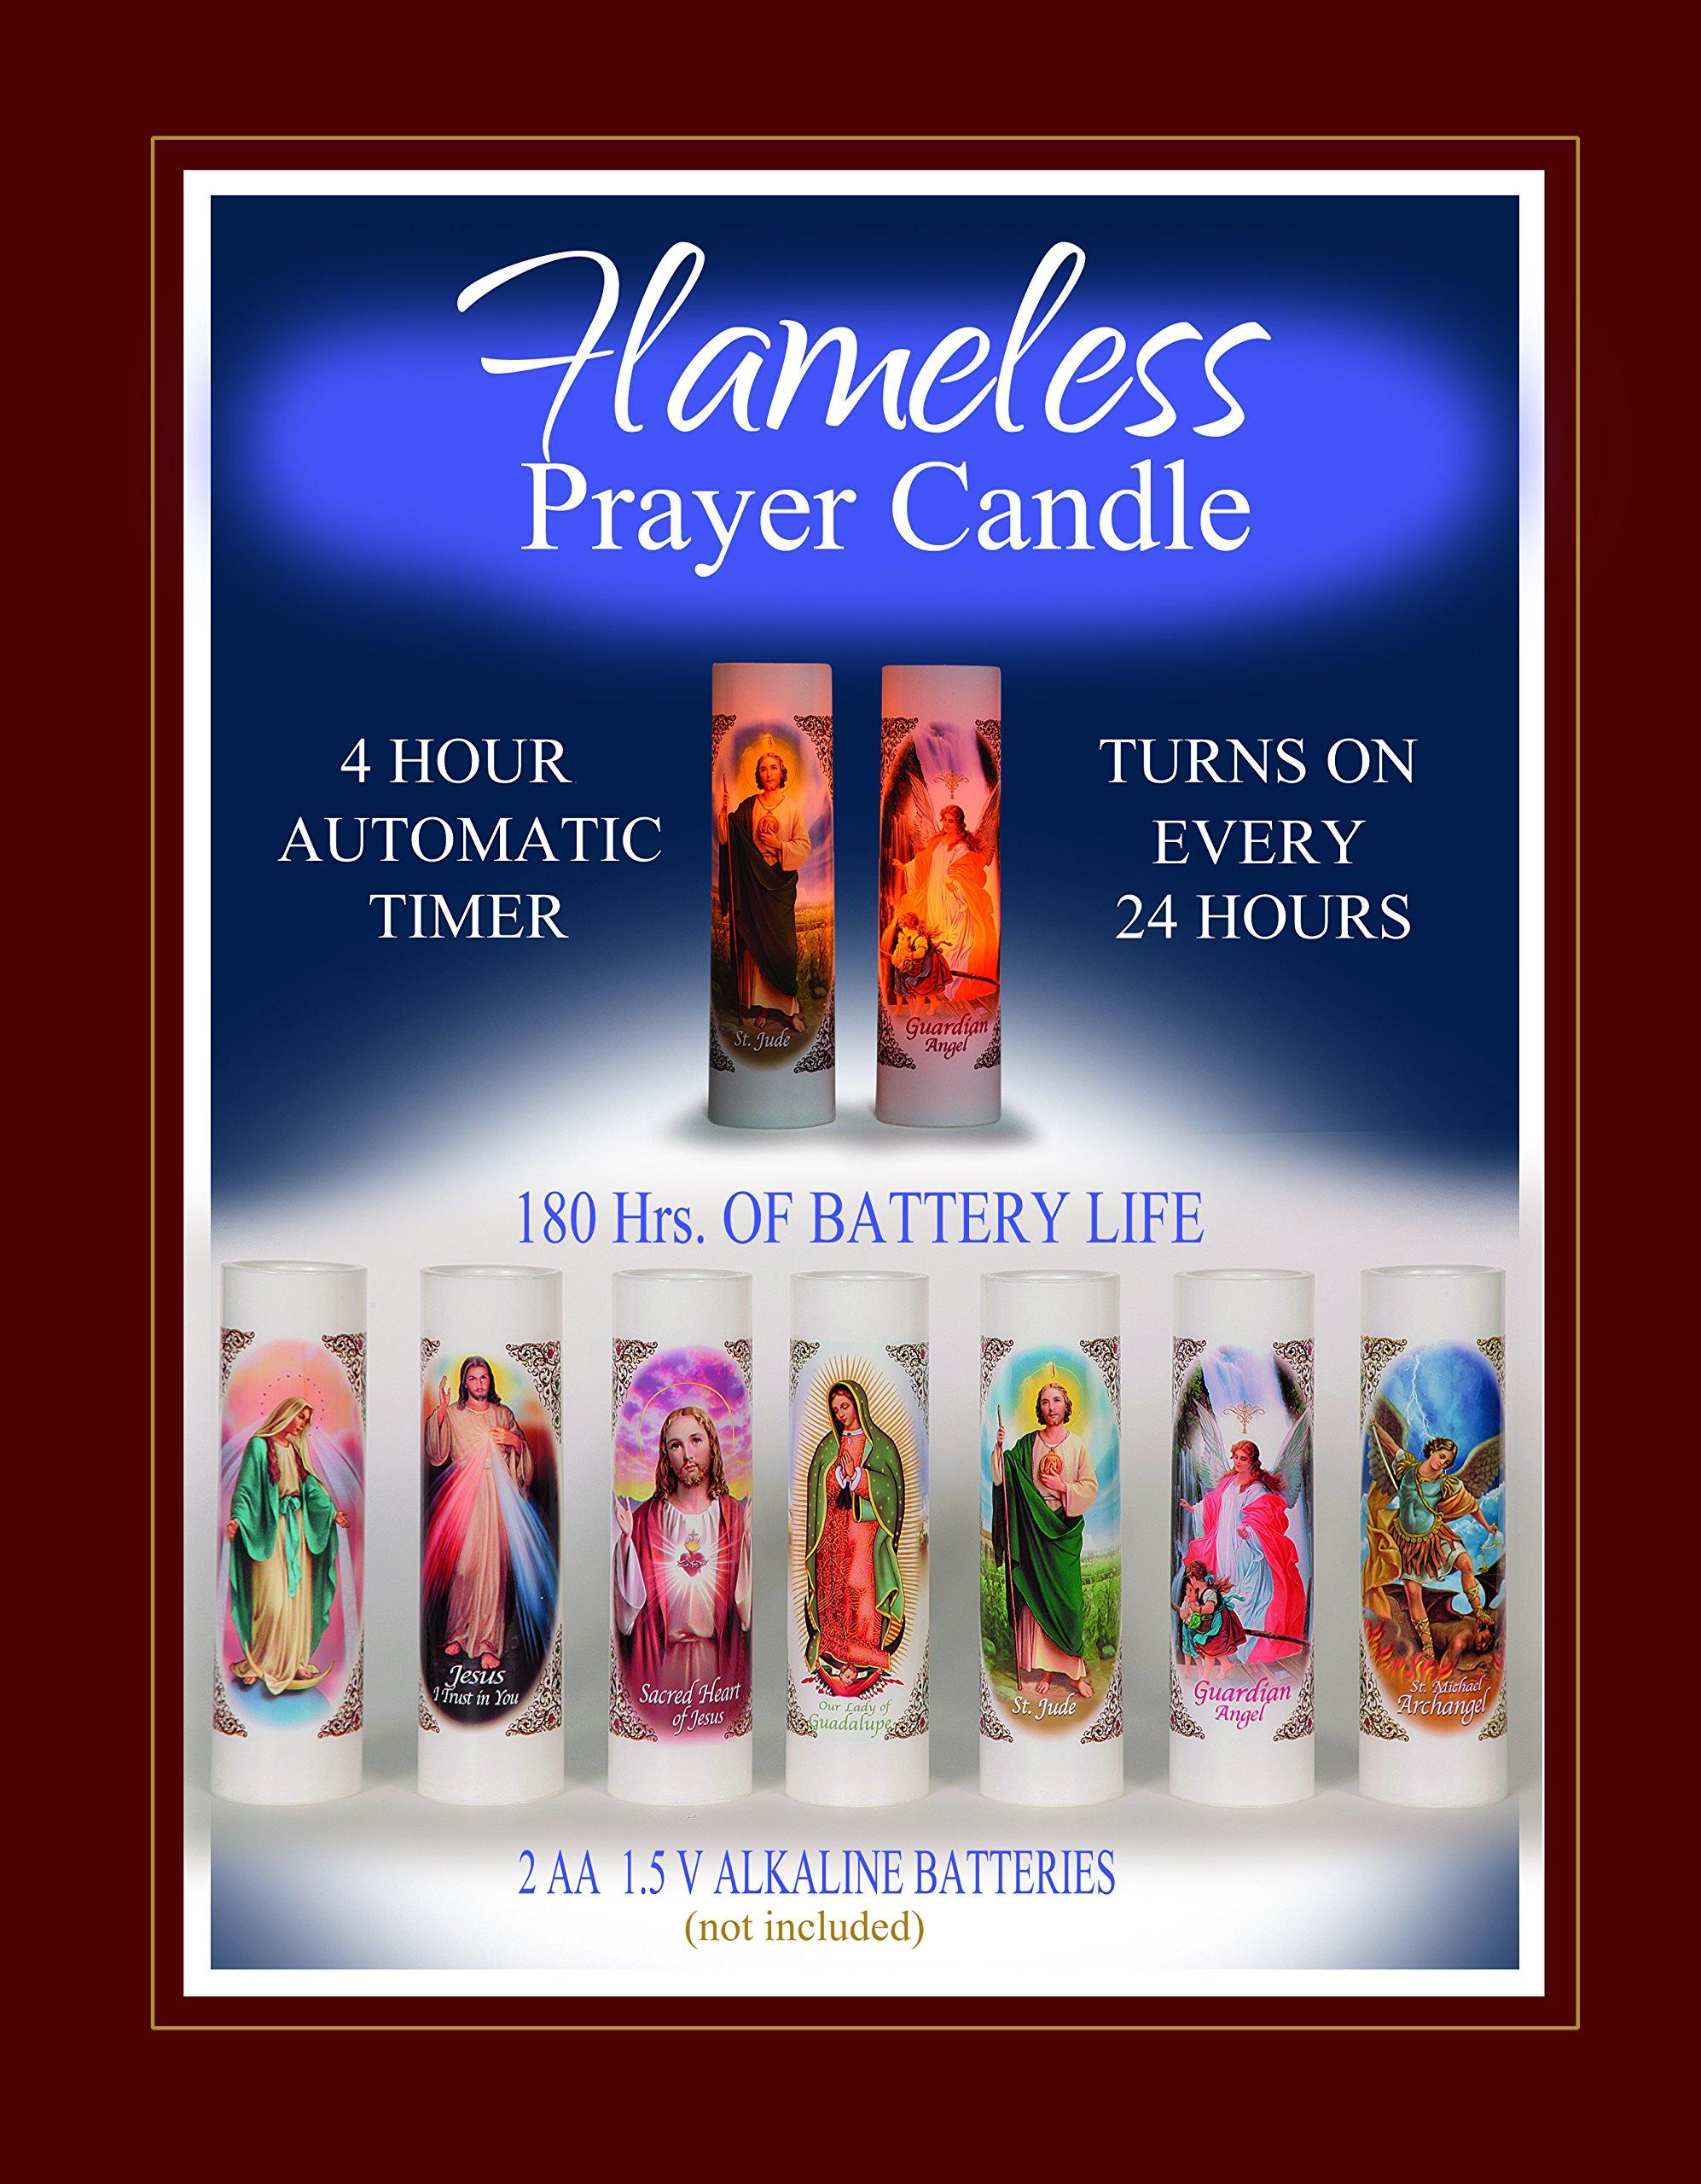 Jude San Judas Tadeo St LED Flameless Prayer Candle with Automatic Timer 7-Day Novena Candlelight Vigils Catholic Religious Gifts Bright Glow Candle Co. English /& Spanish